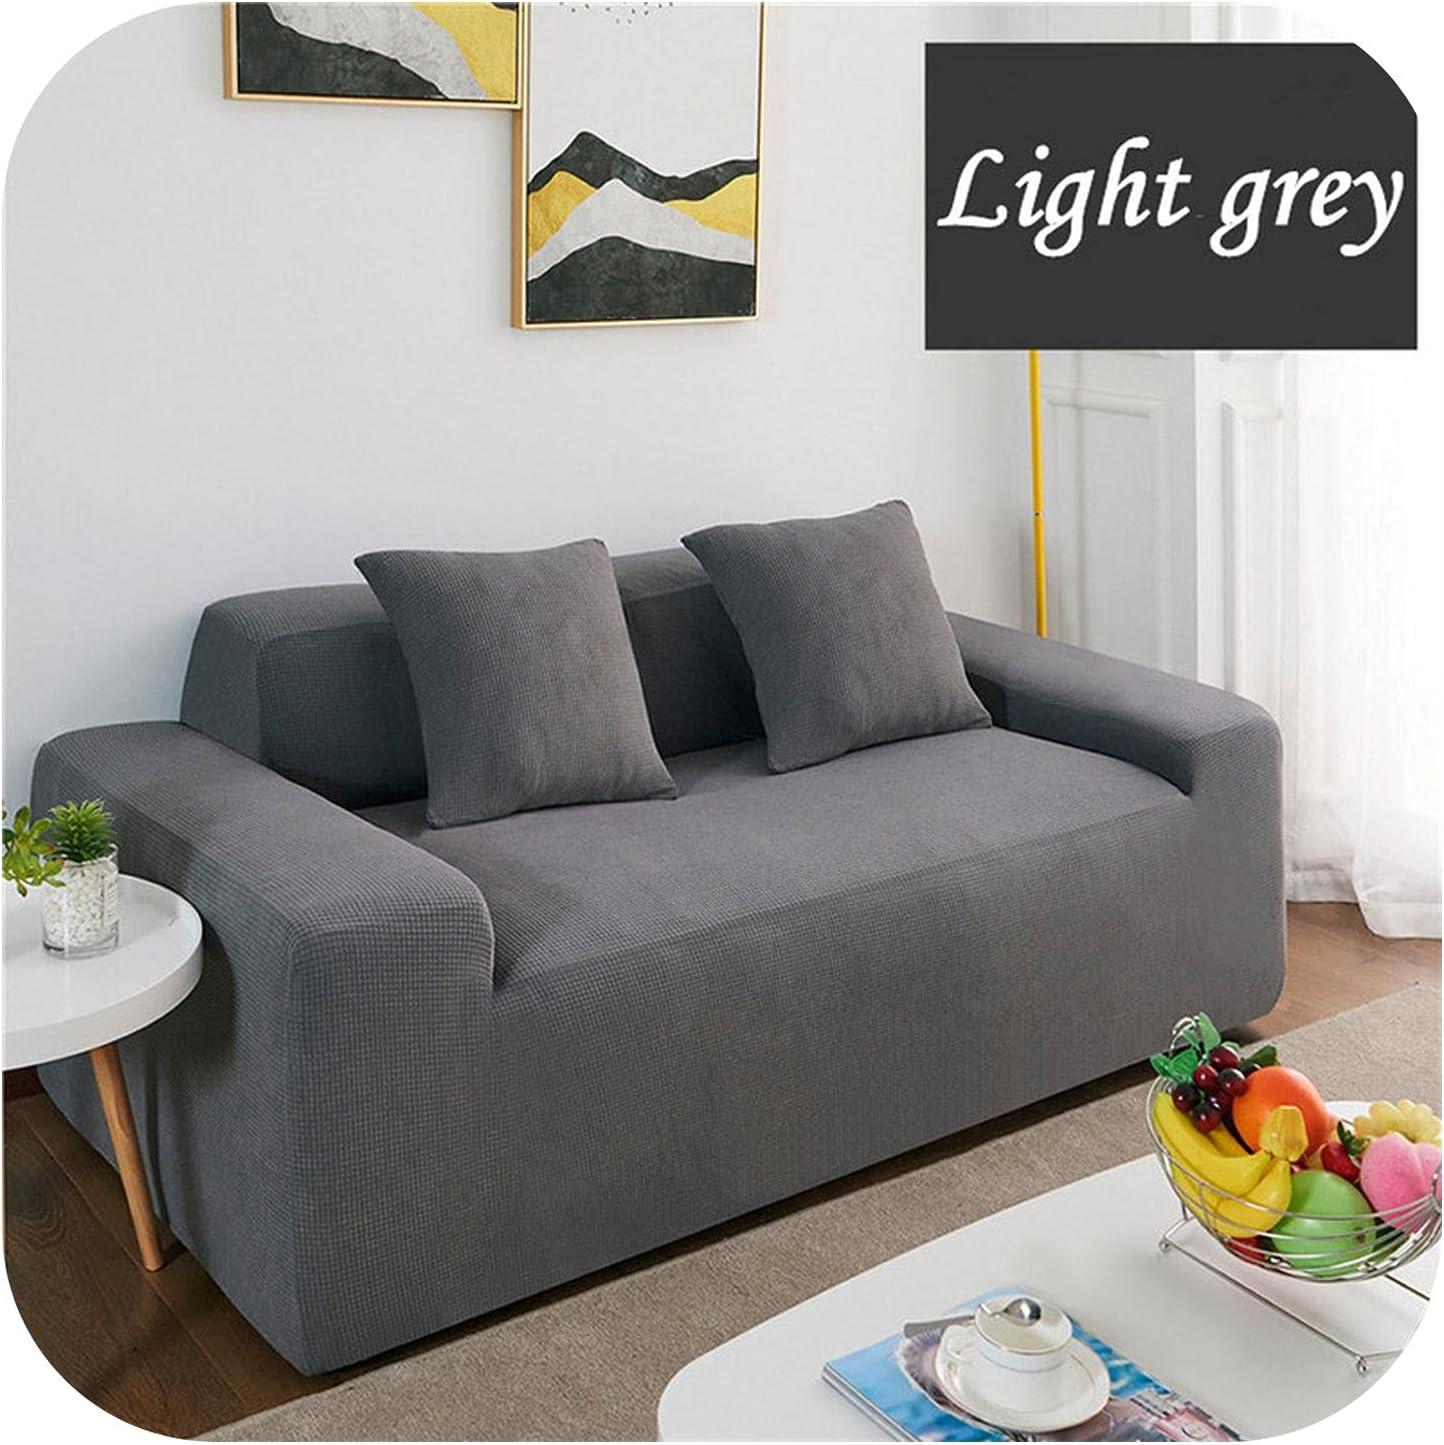 Waterproof Sofa Cover Soft Slipcovers trust Plaid Spandex Elastic Genuine Free Shipping Clot